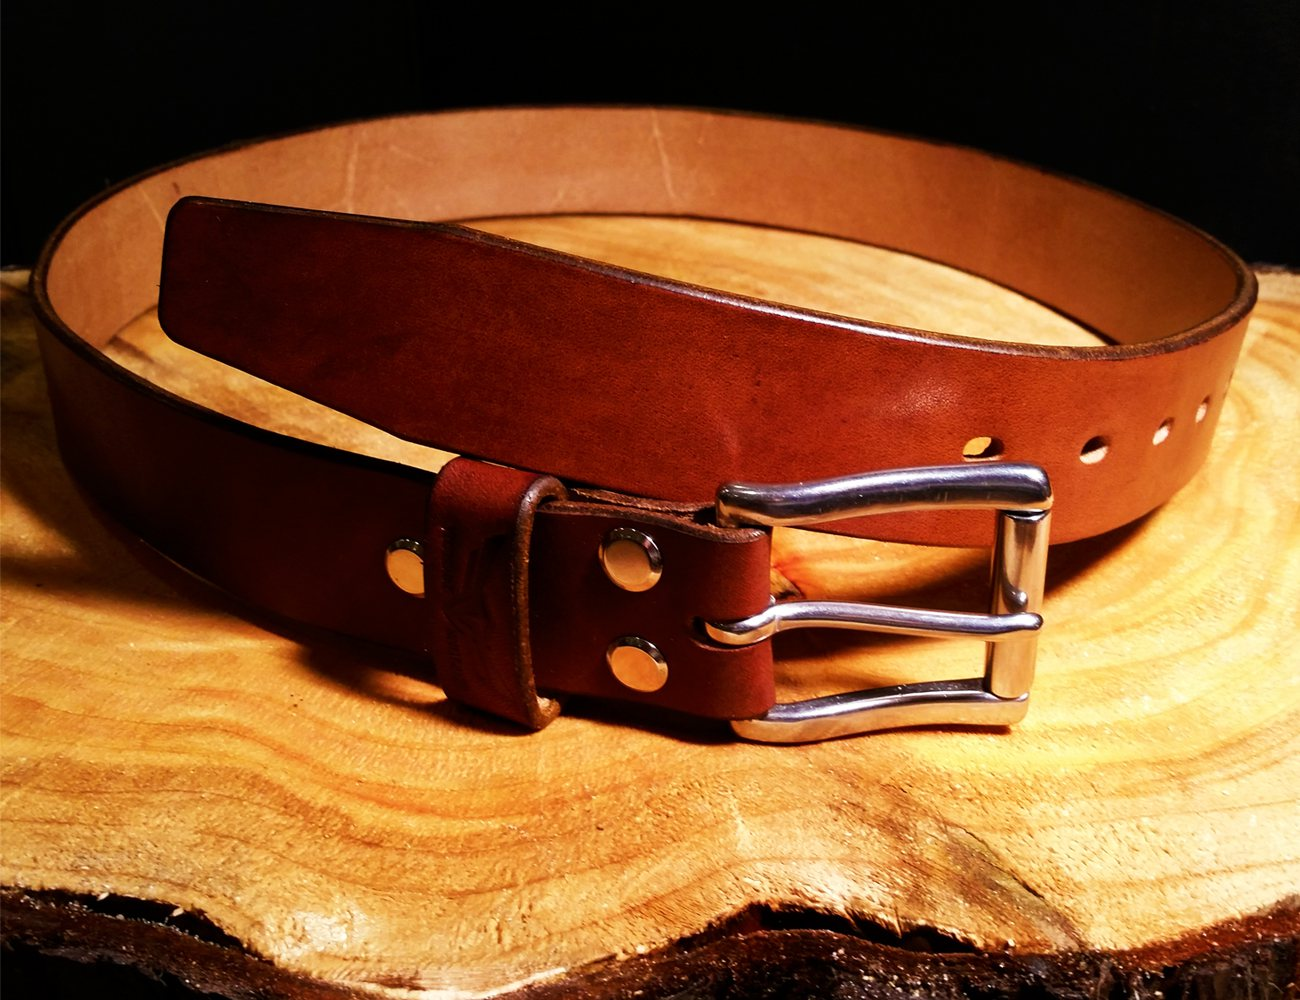 The Oak Bark Belt – Built To Outlast Its Owner!